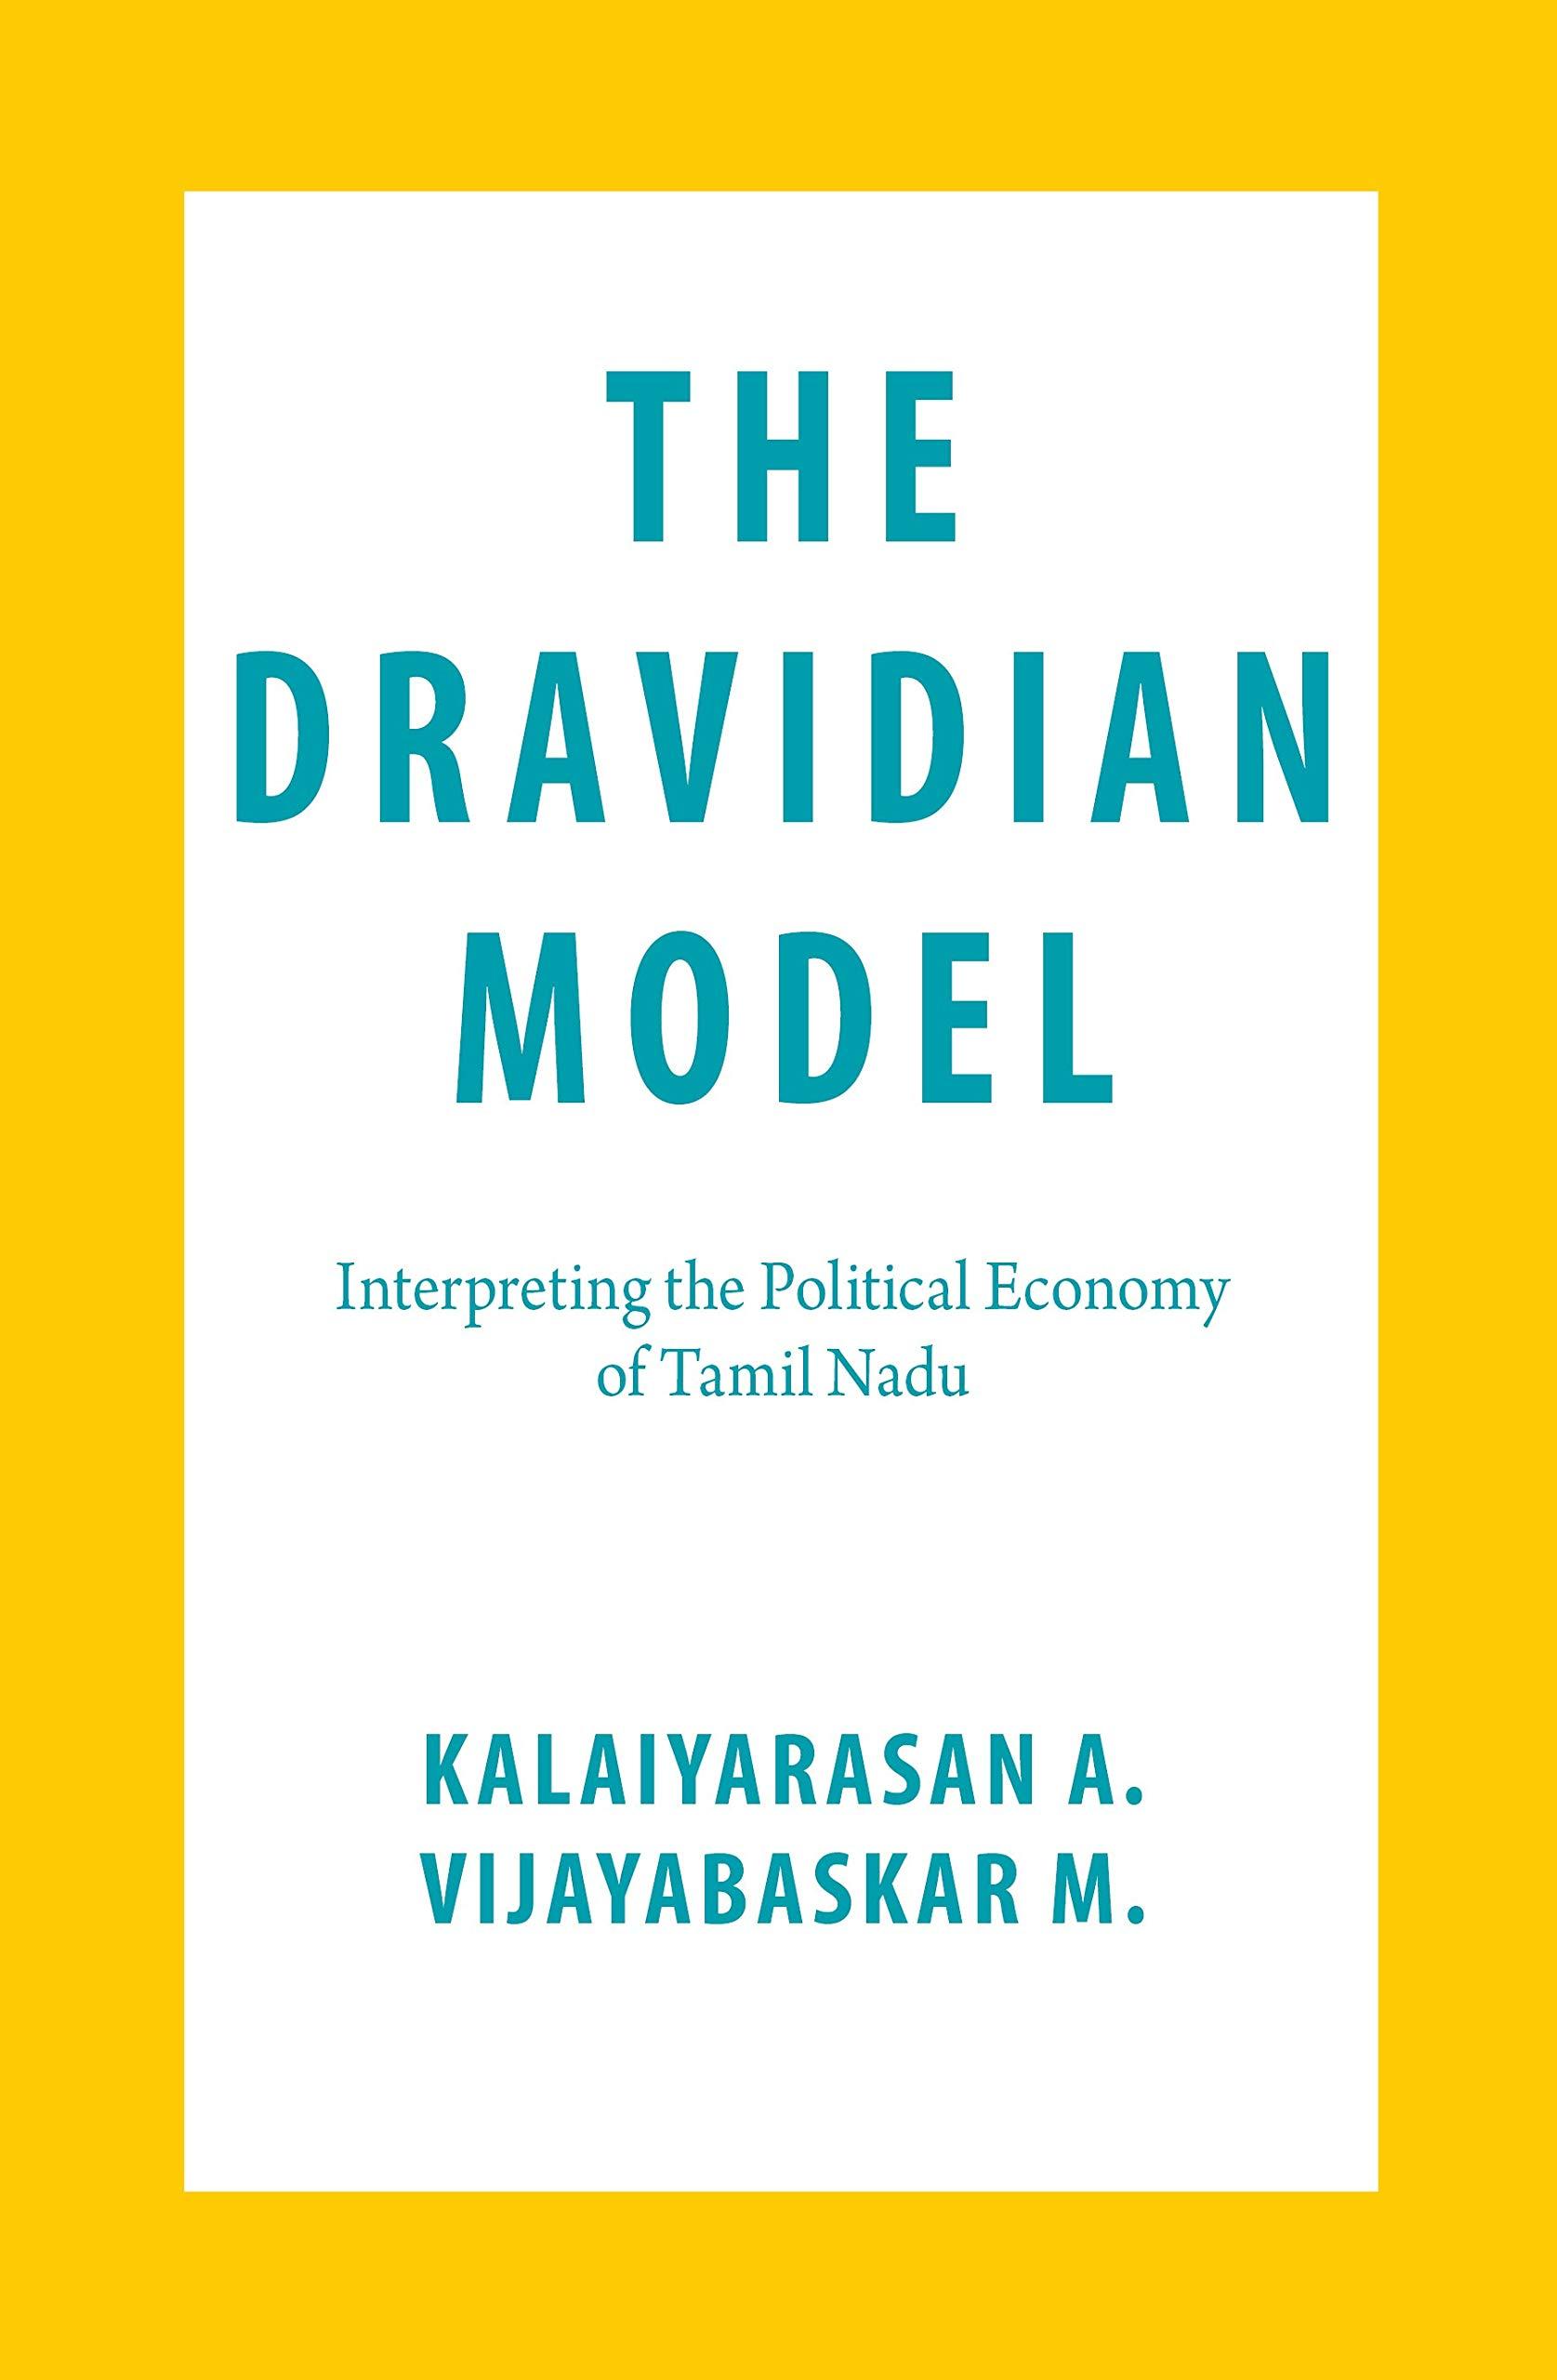 The Dravidian Model - Interpreting the Political Economy of Tamil Nadu